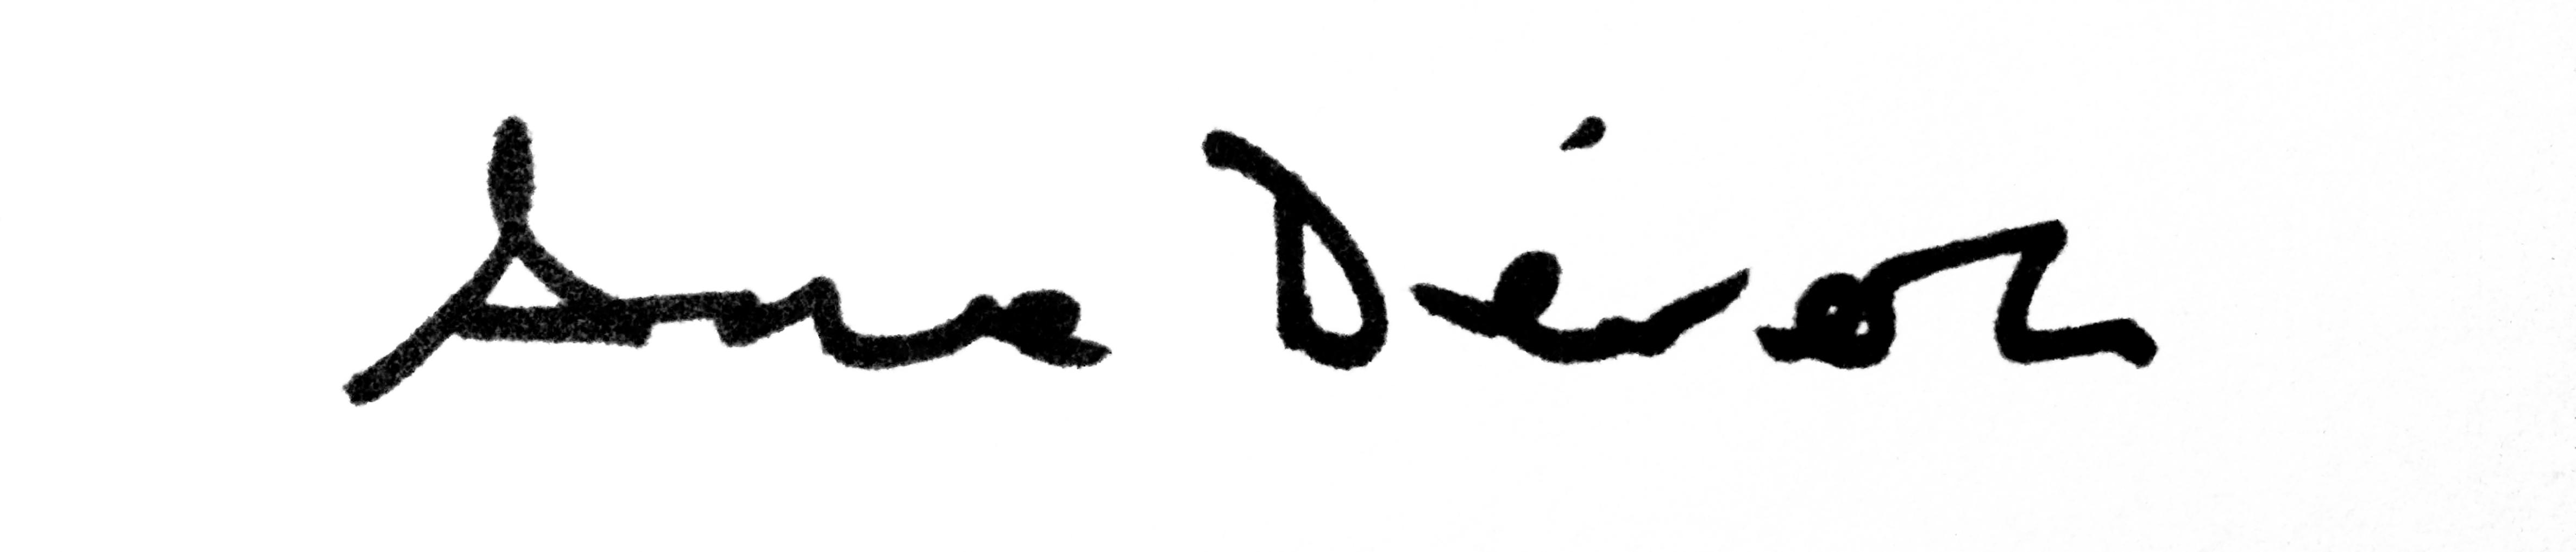 Ana Dévora's Signature